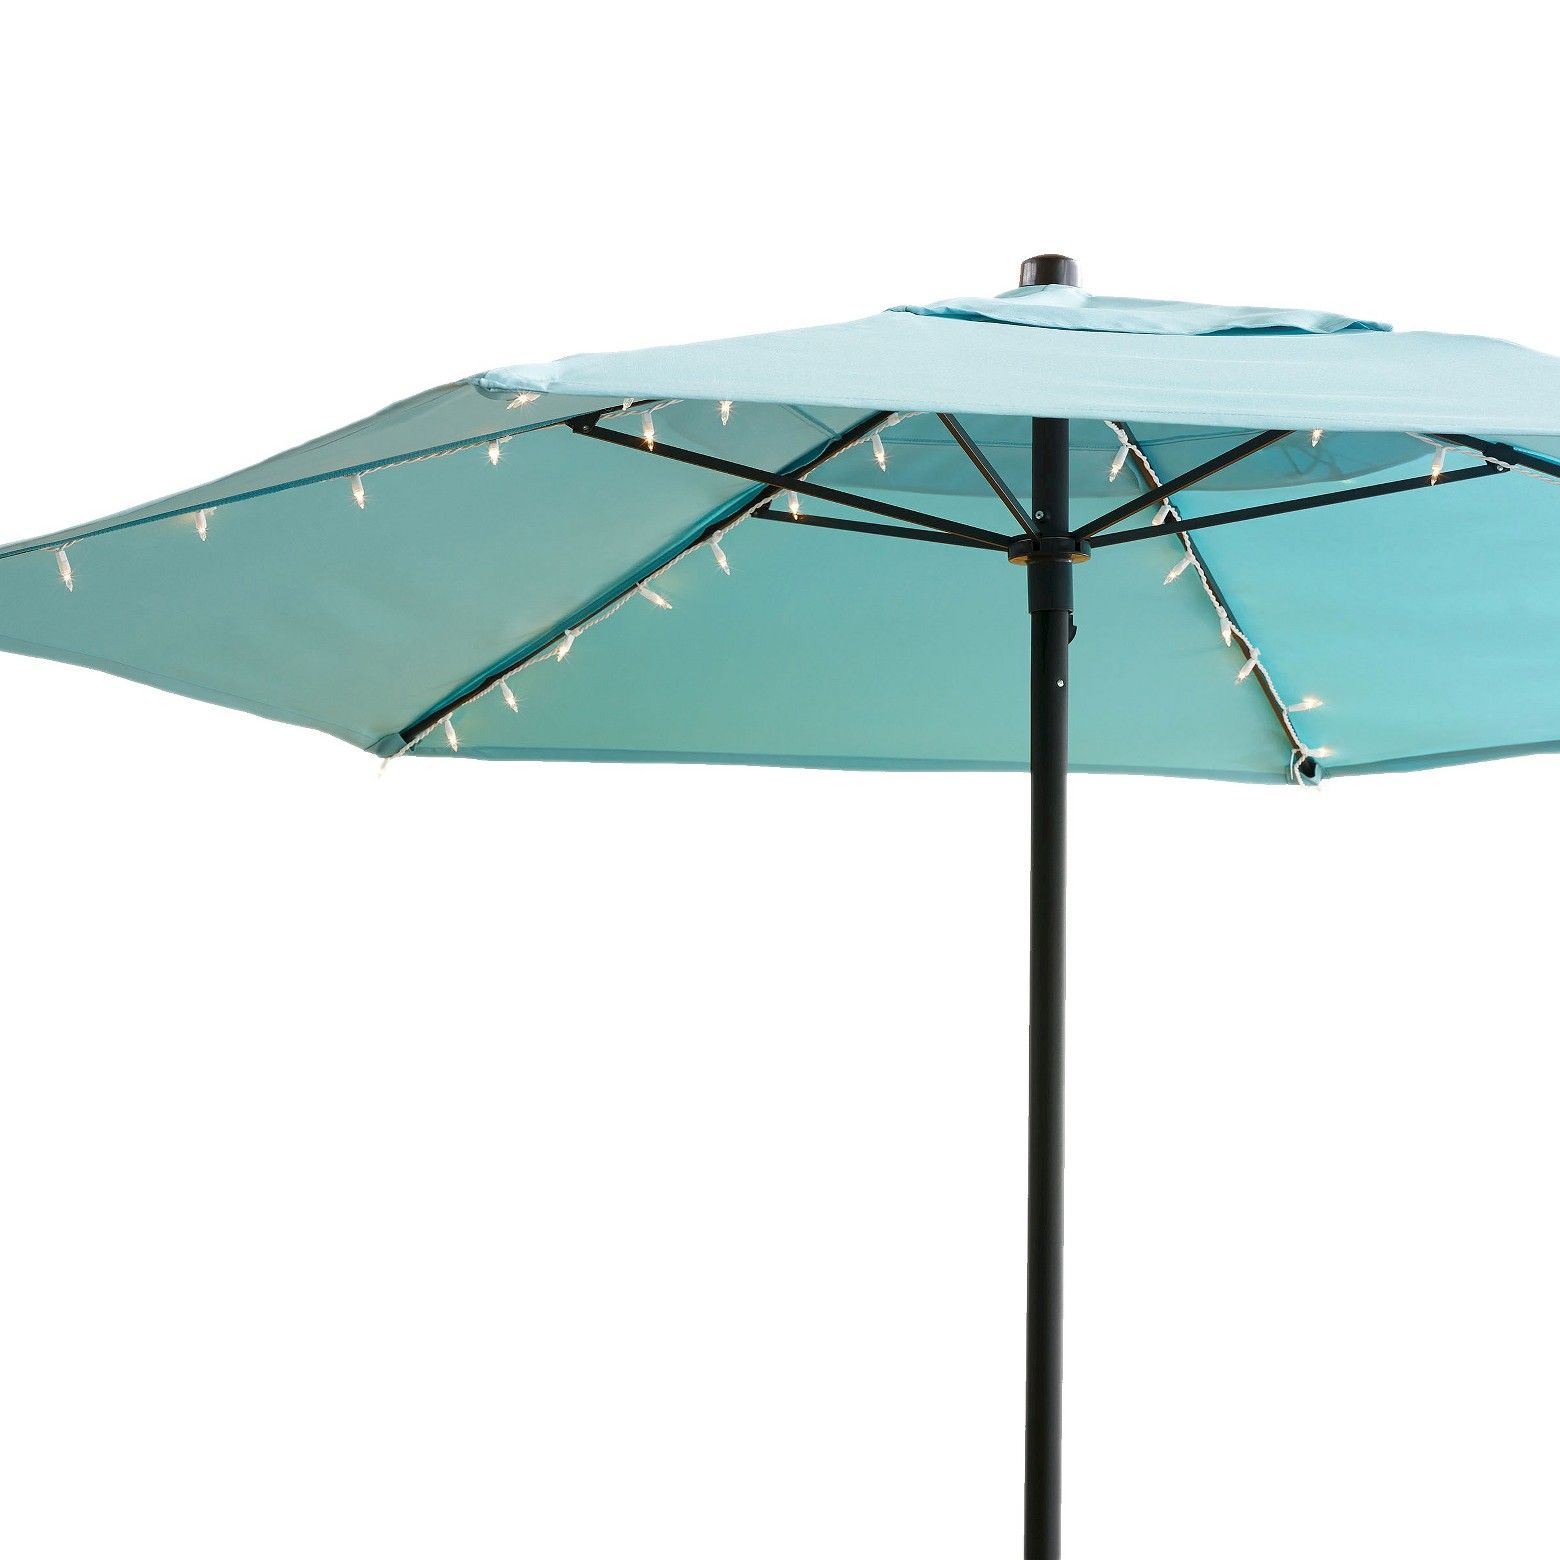 diy target lighting light full mini umbrella for christmas at table rectangular patio icamblog inside led umbrellas lights solar furniture size bar string